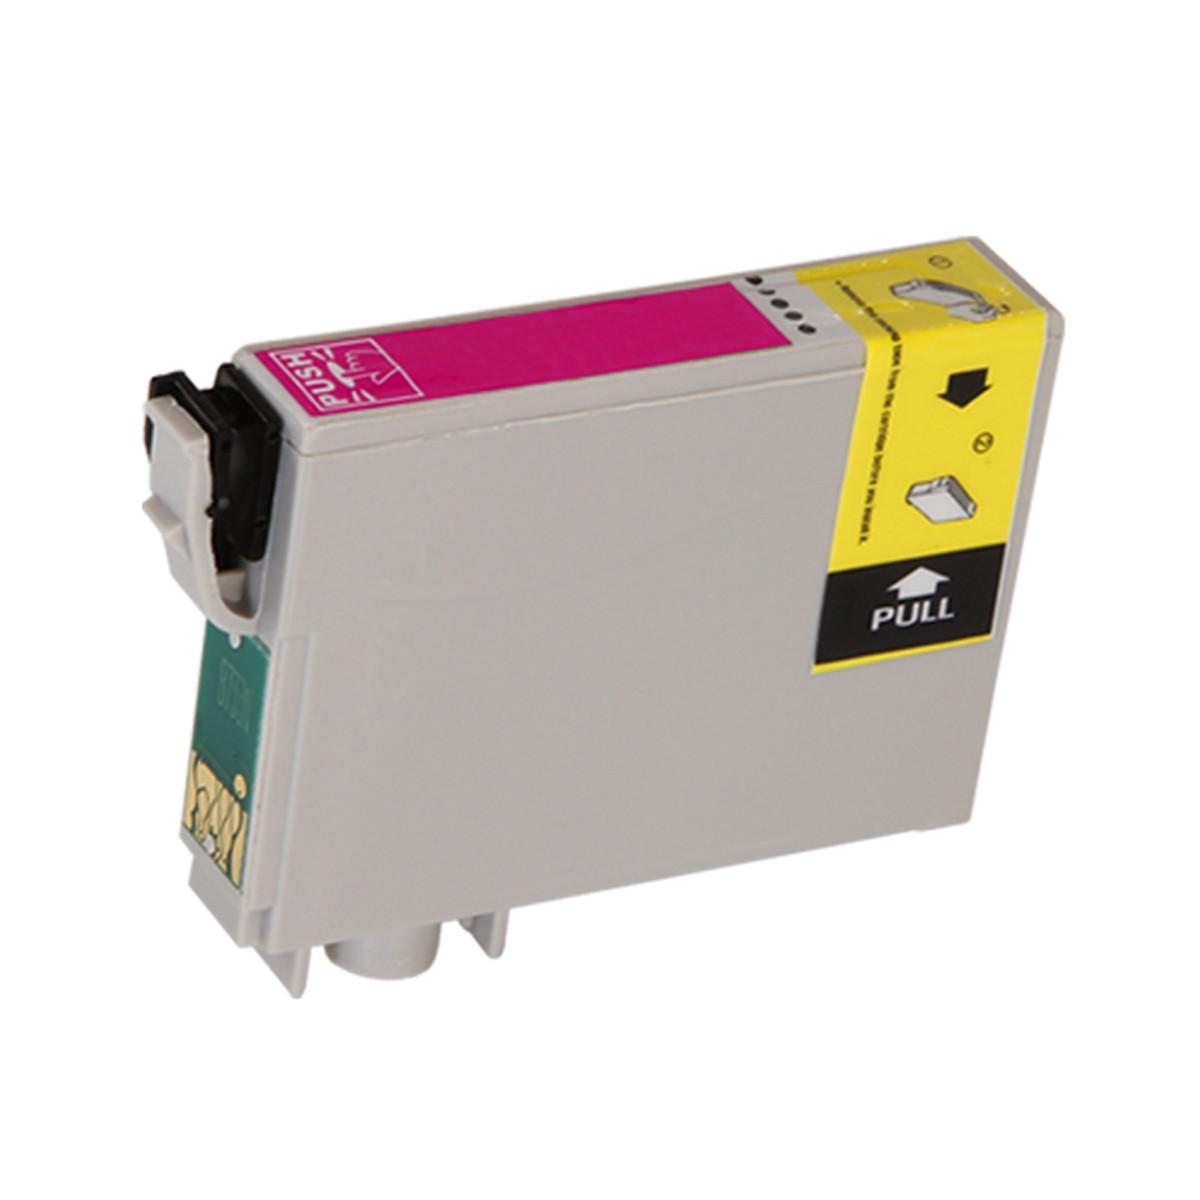 Cartucho de Tinta Compatível com Epson T082320 T082 T0823 Magenta | R290 R270 R390 RX590 T50 | 12ml